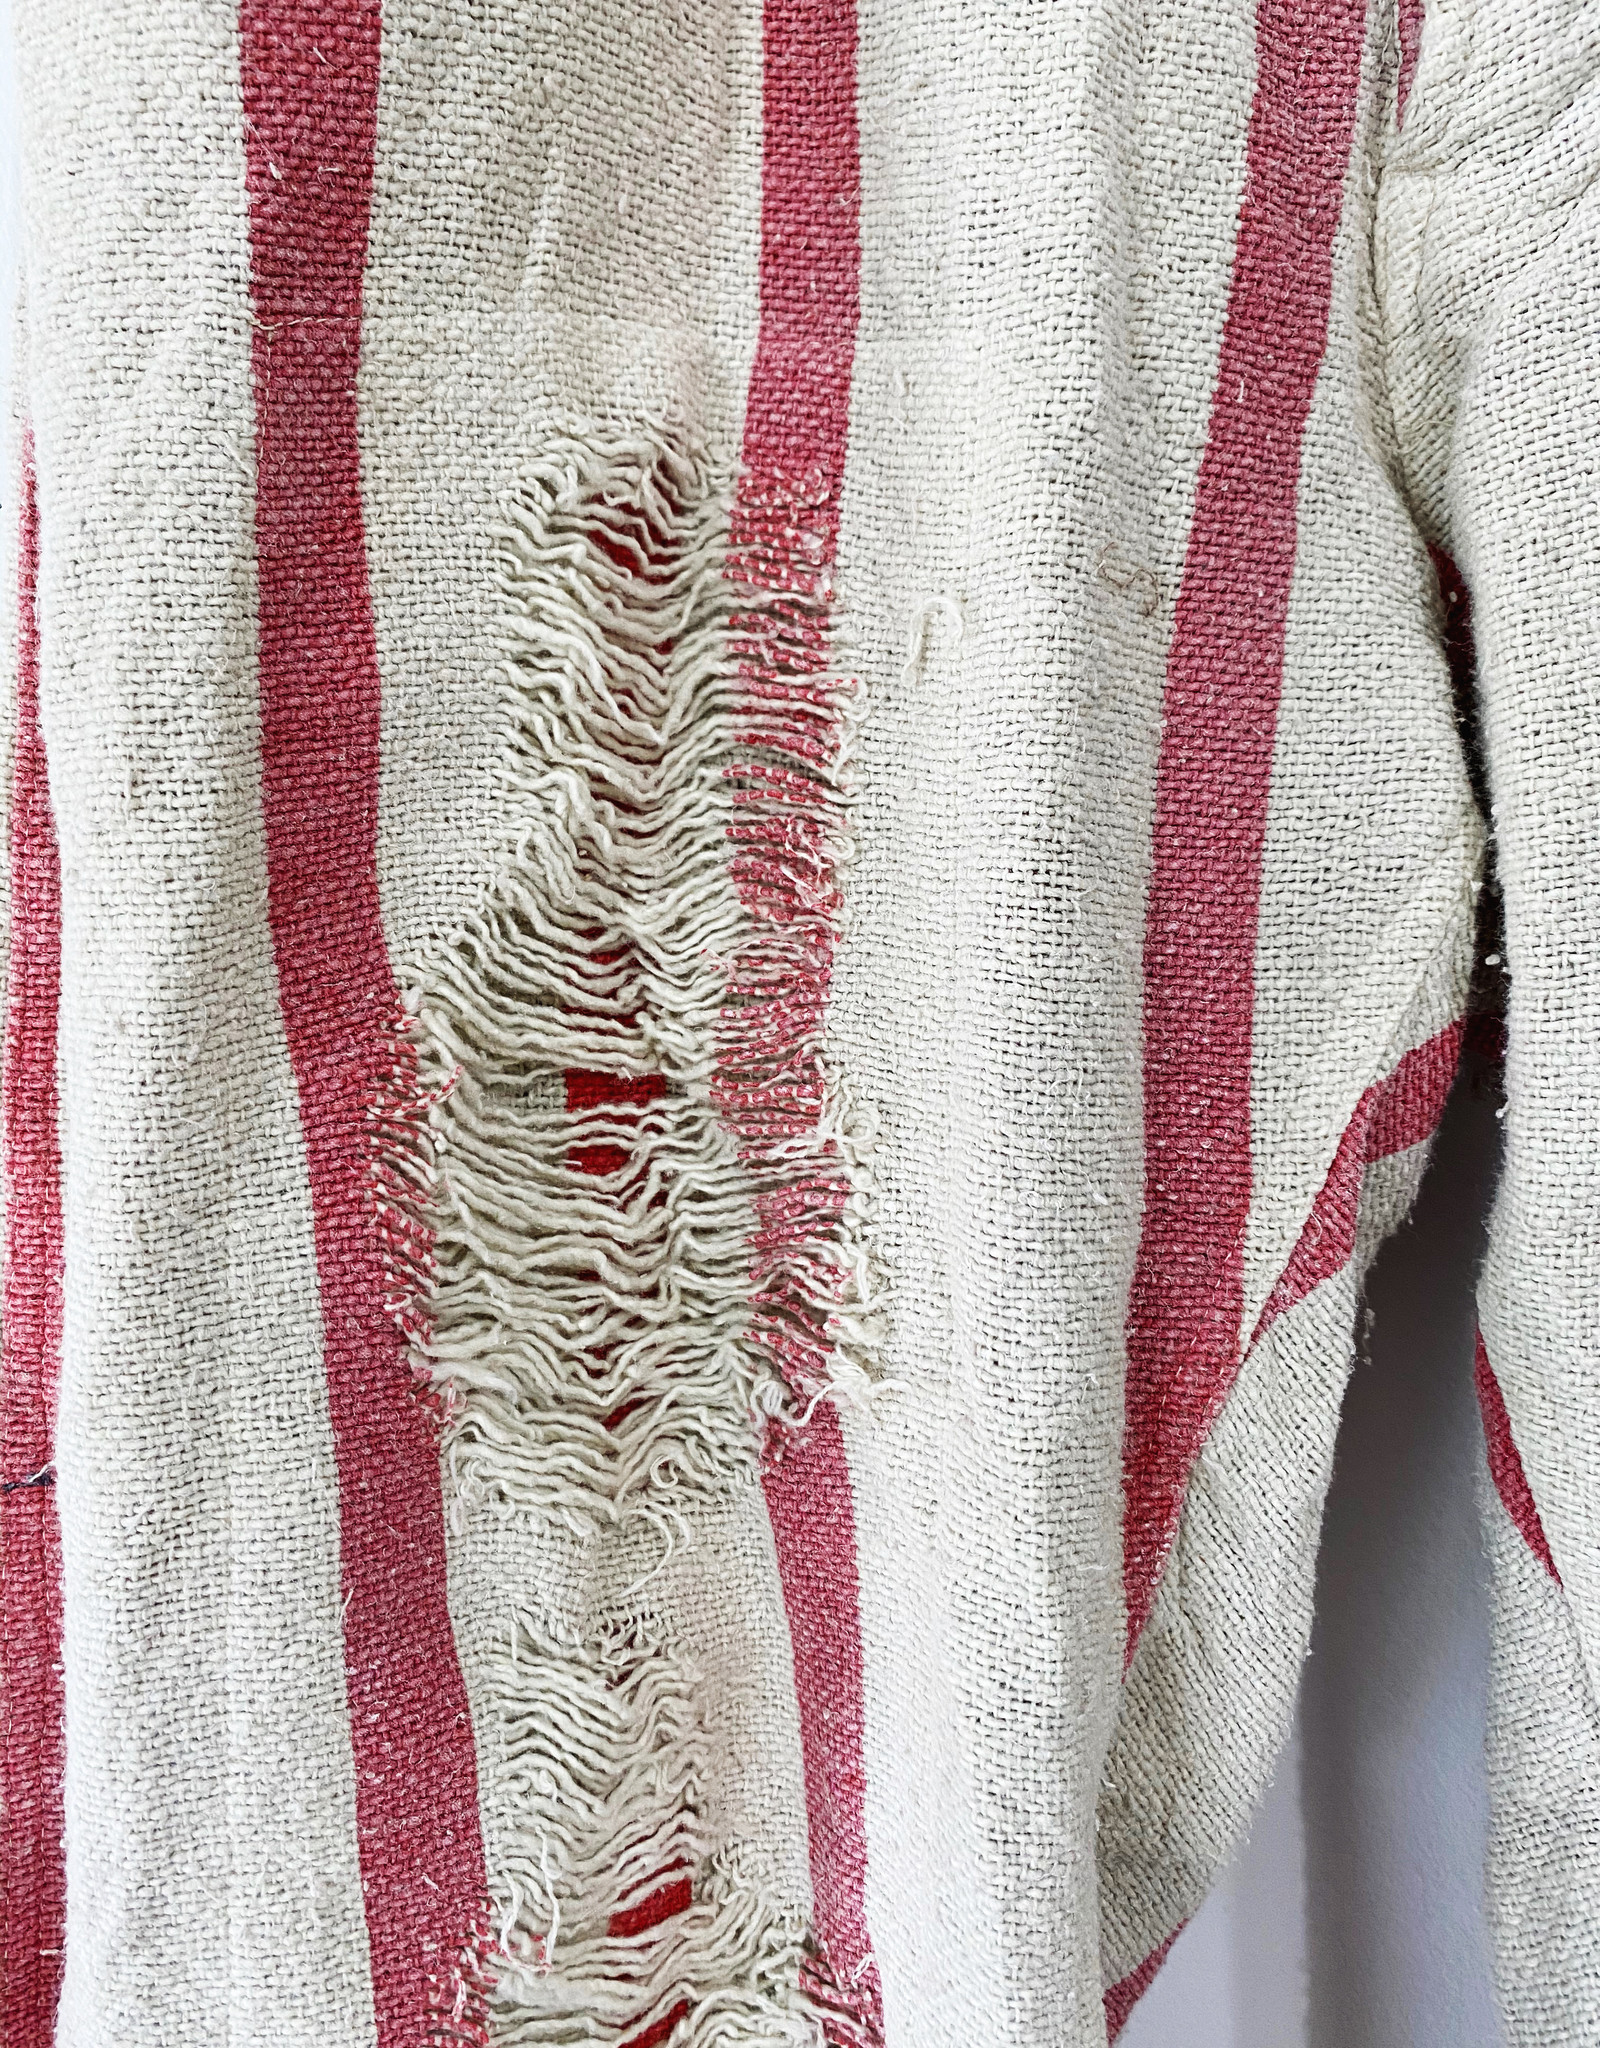 MAGNOLIA PEARL MAGNOLIA PEARL PANTS 193